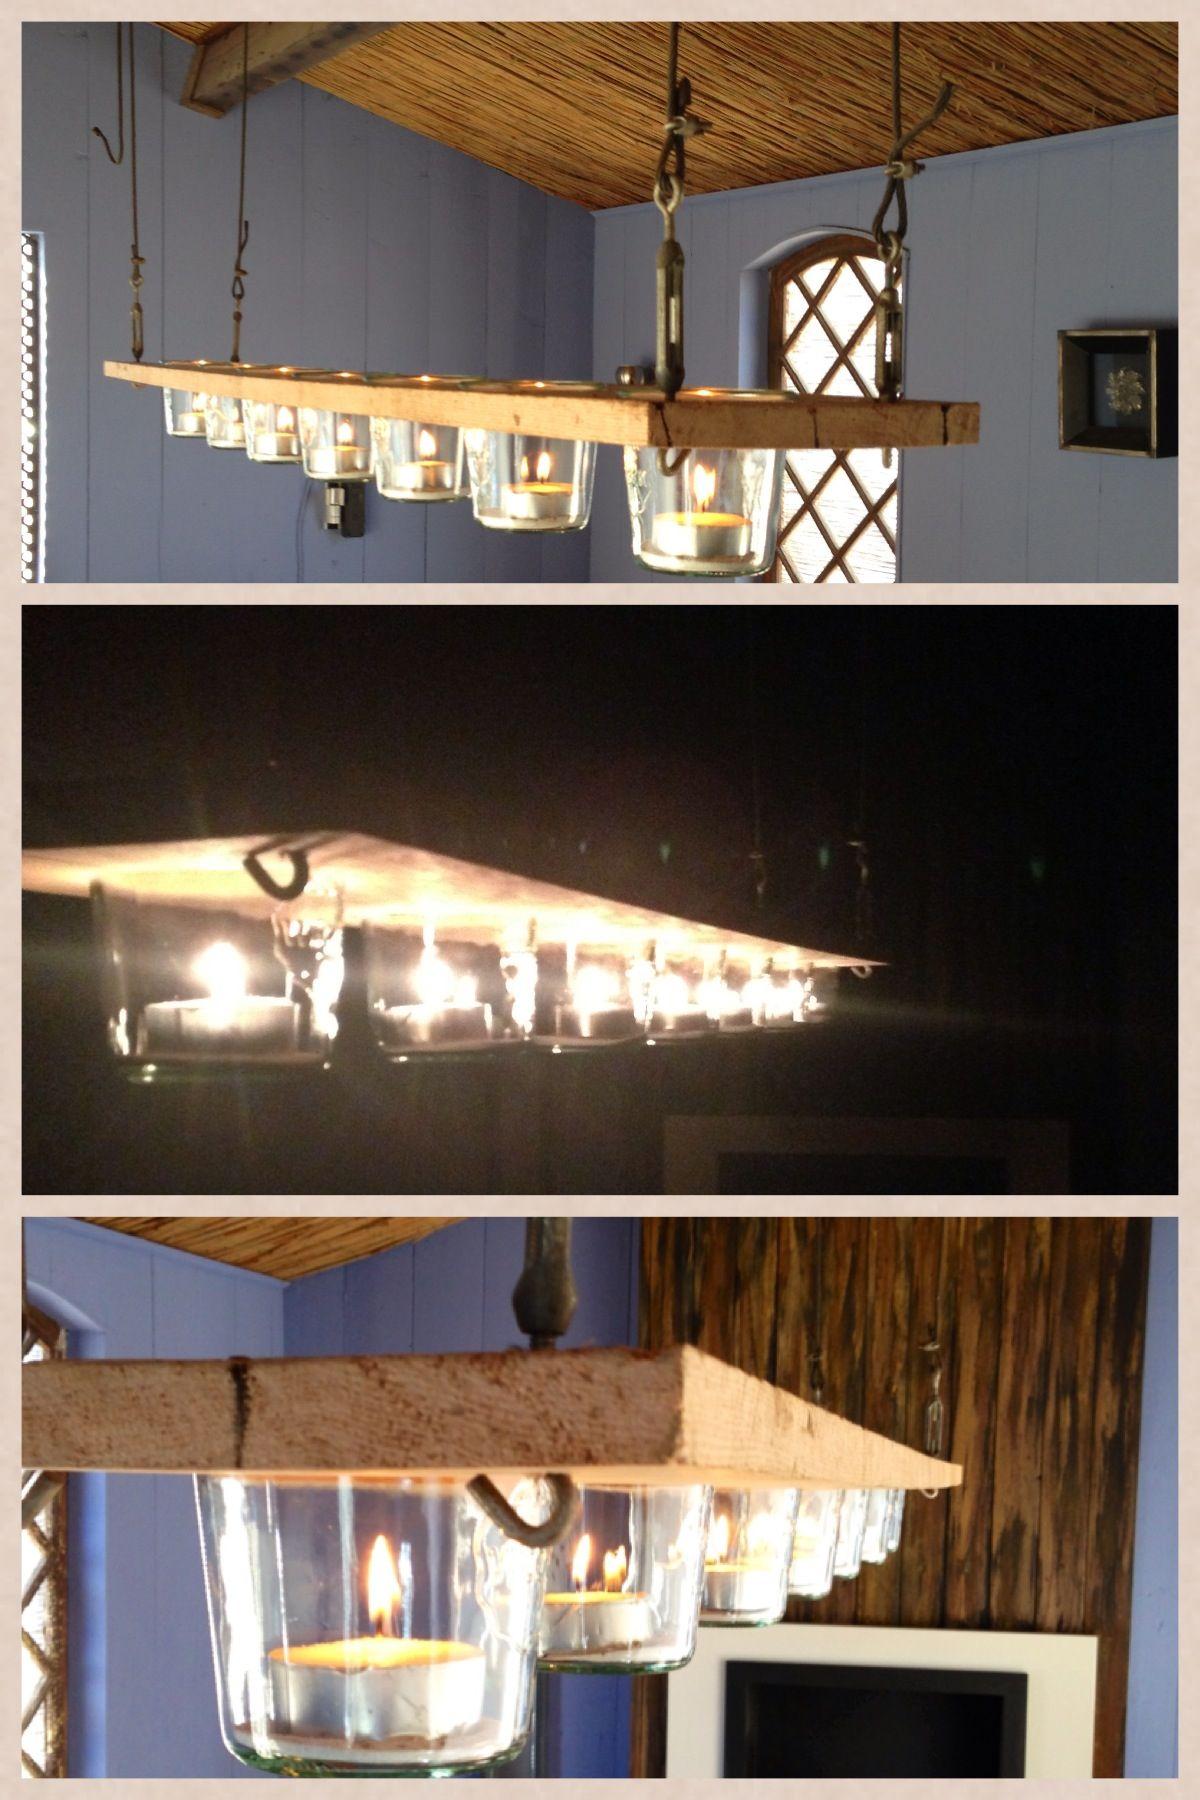 Pin By Weck Jars On Light Weck Jars Diy Lighting Home Decor Inspiration